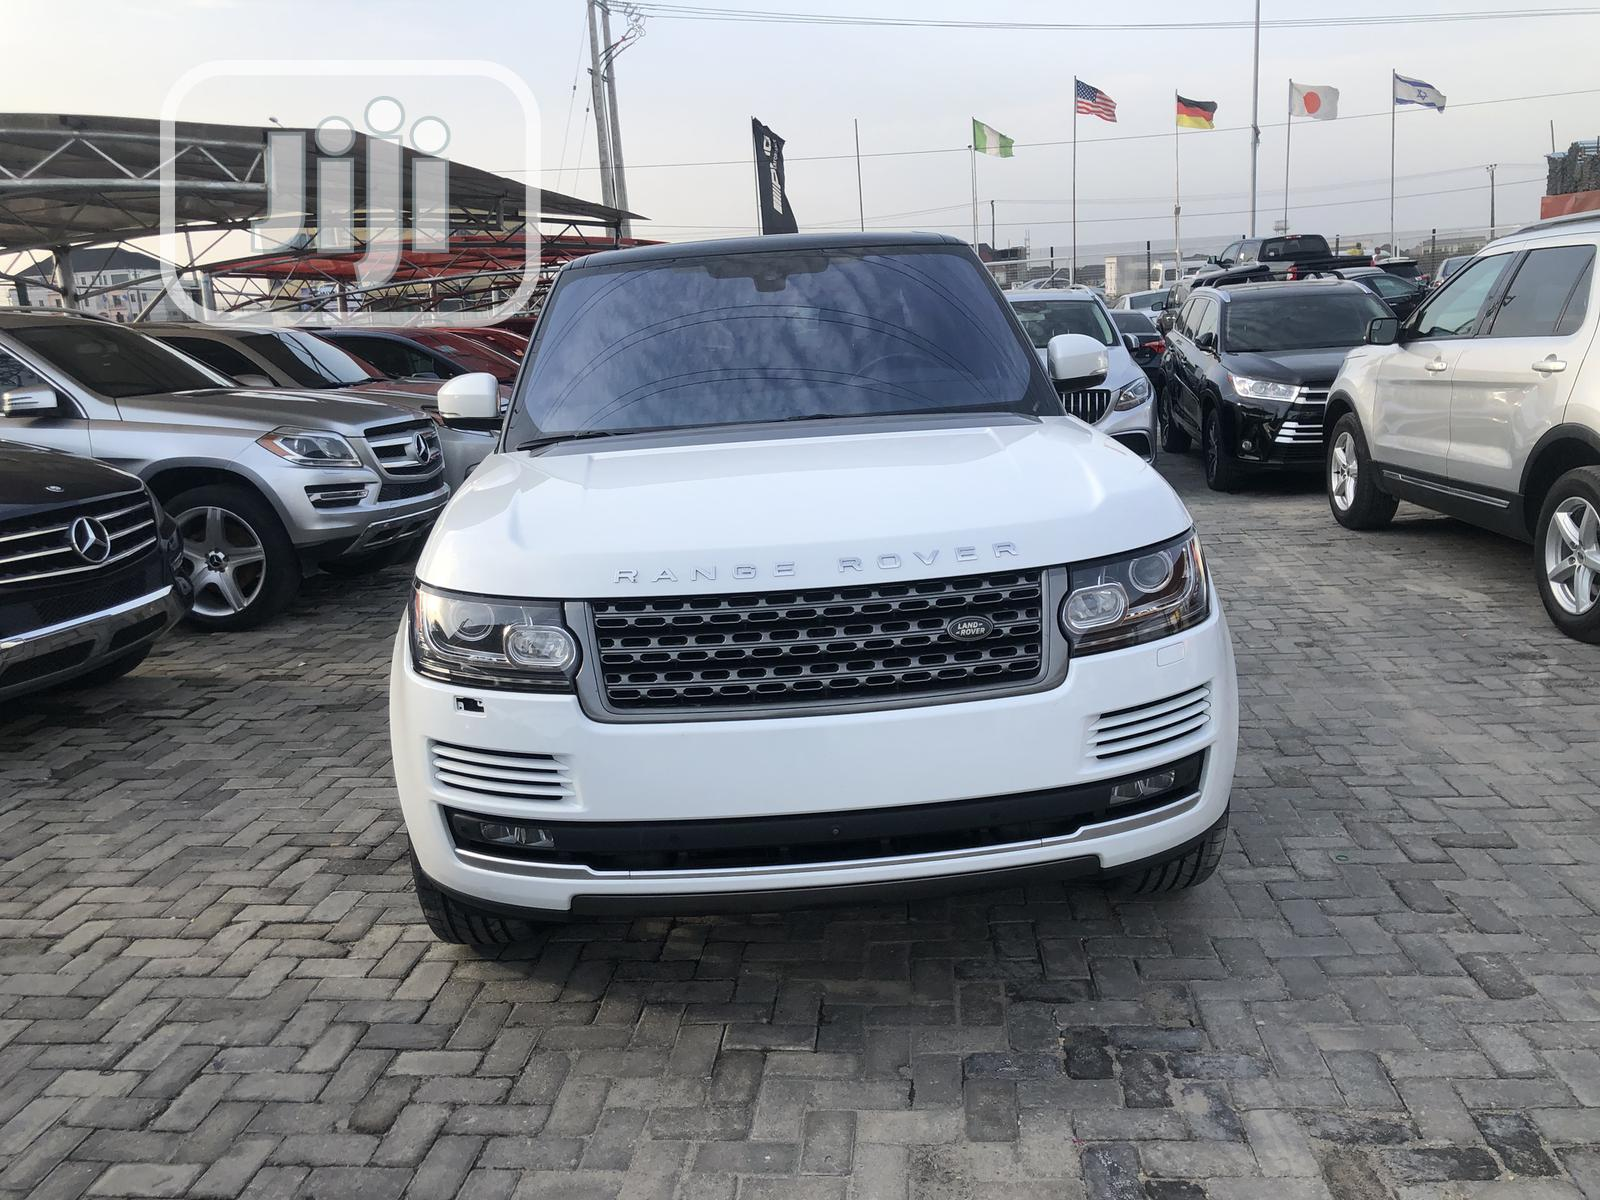 Land Rover Range Rover Vogue 2017 White